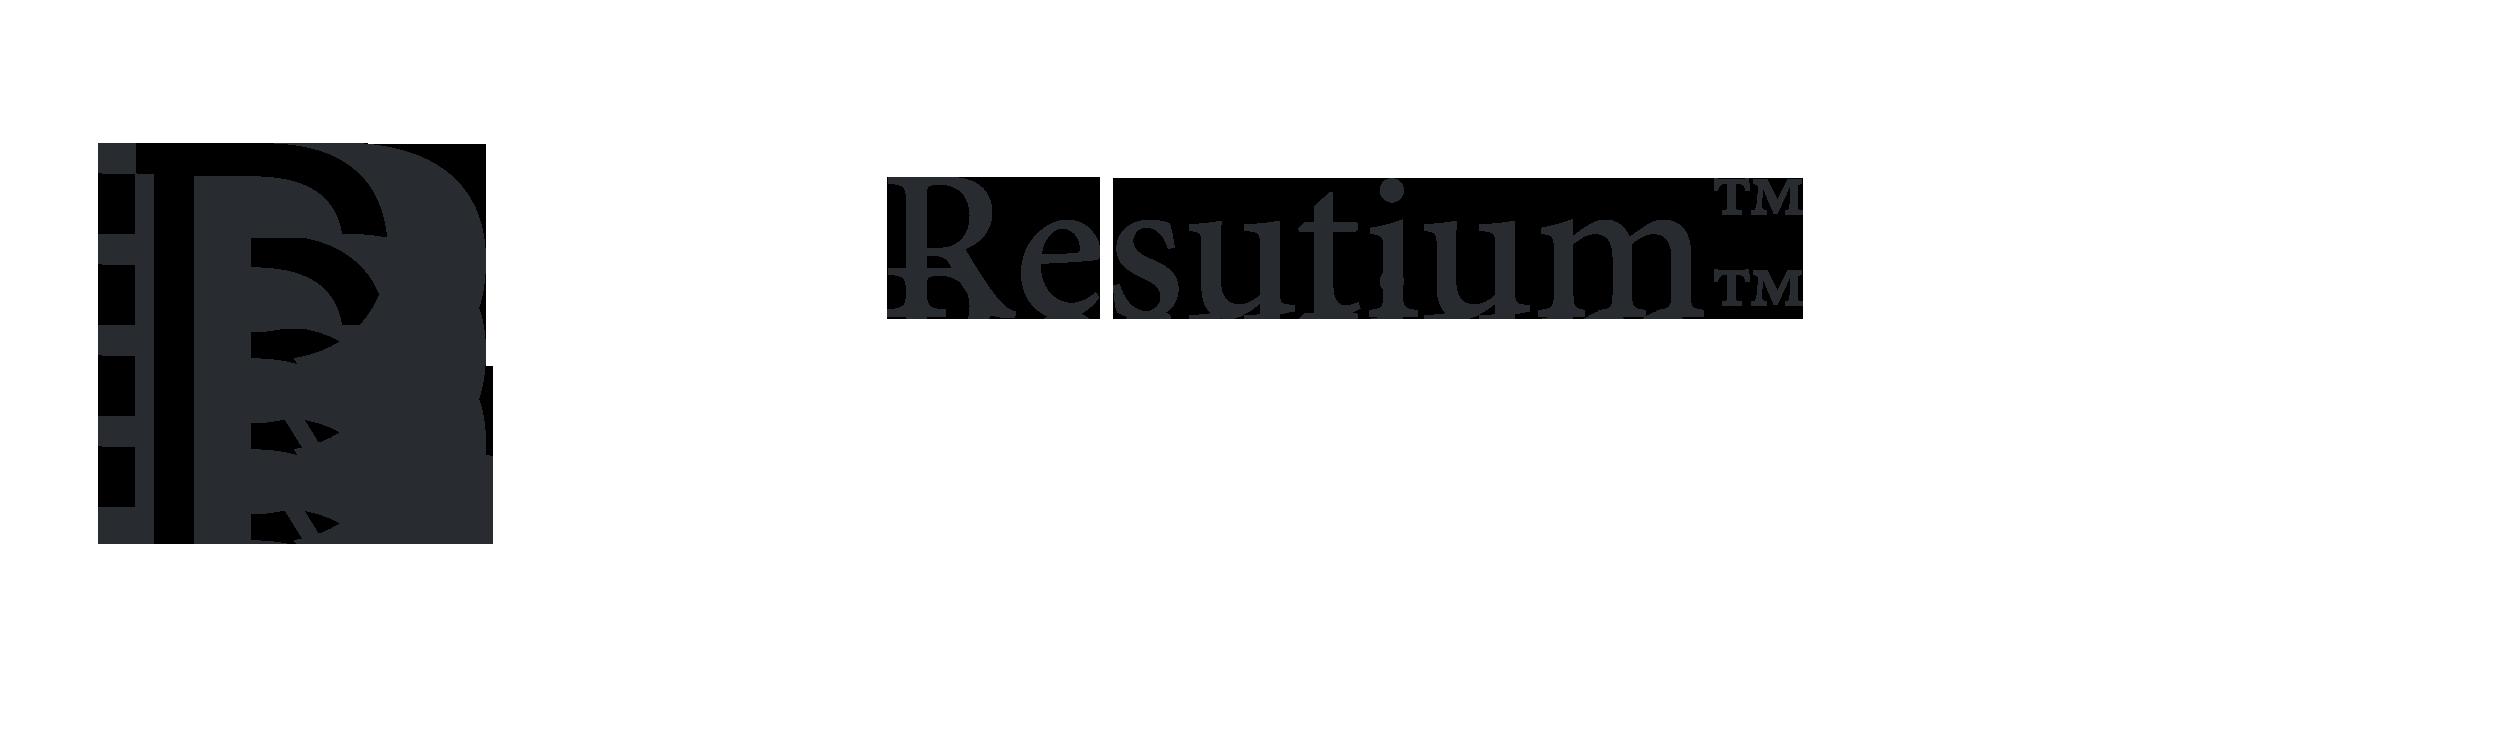 BCD_Projects_ID_Resutium_01